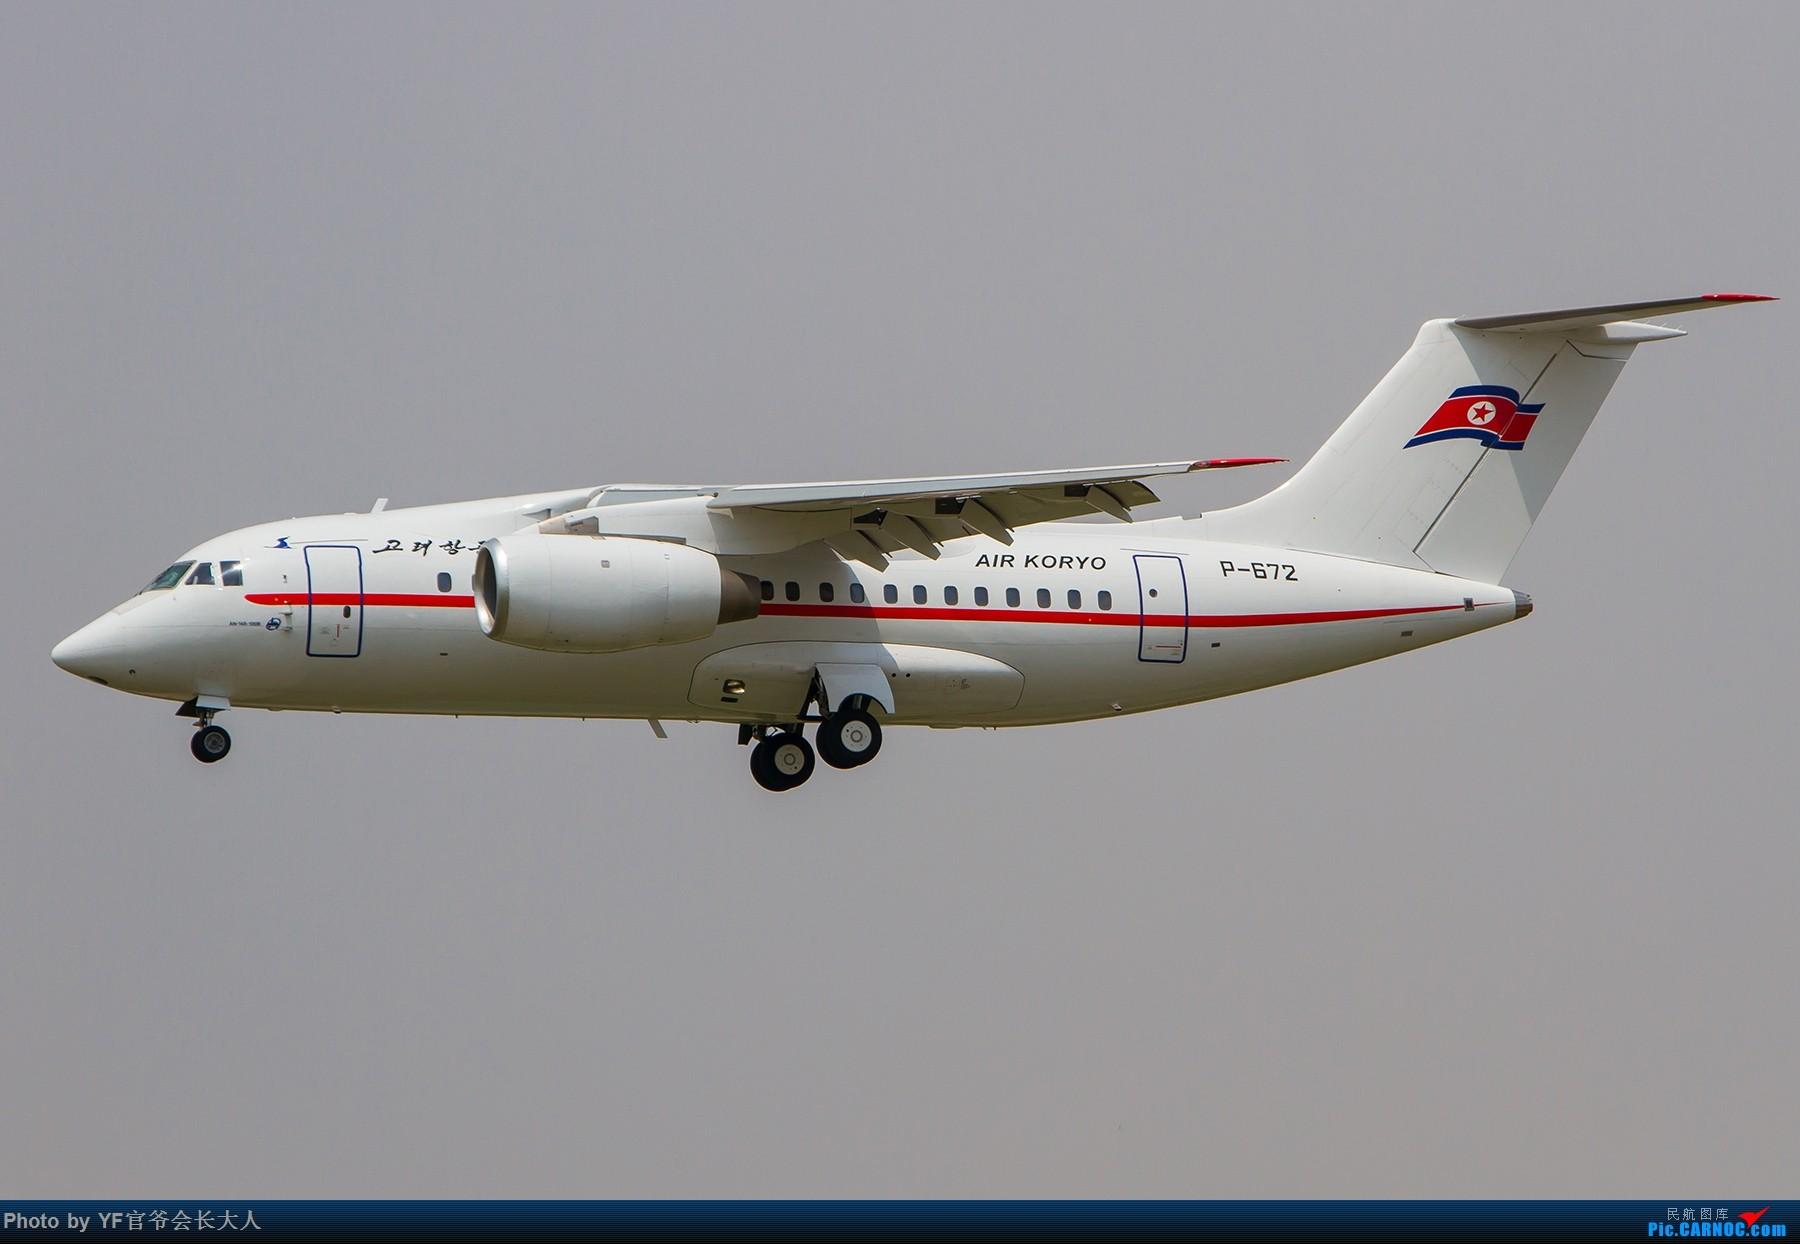 Re:[原创]【ZYTX】轻易不拍机,拍就要拍个过瘾!(新开的酷鸟,亚洲大西洋,顺带碰上朝韩两国的好货) ANTONOV AN-148 P-672 中国沈阳桃仙国际机场